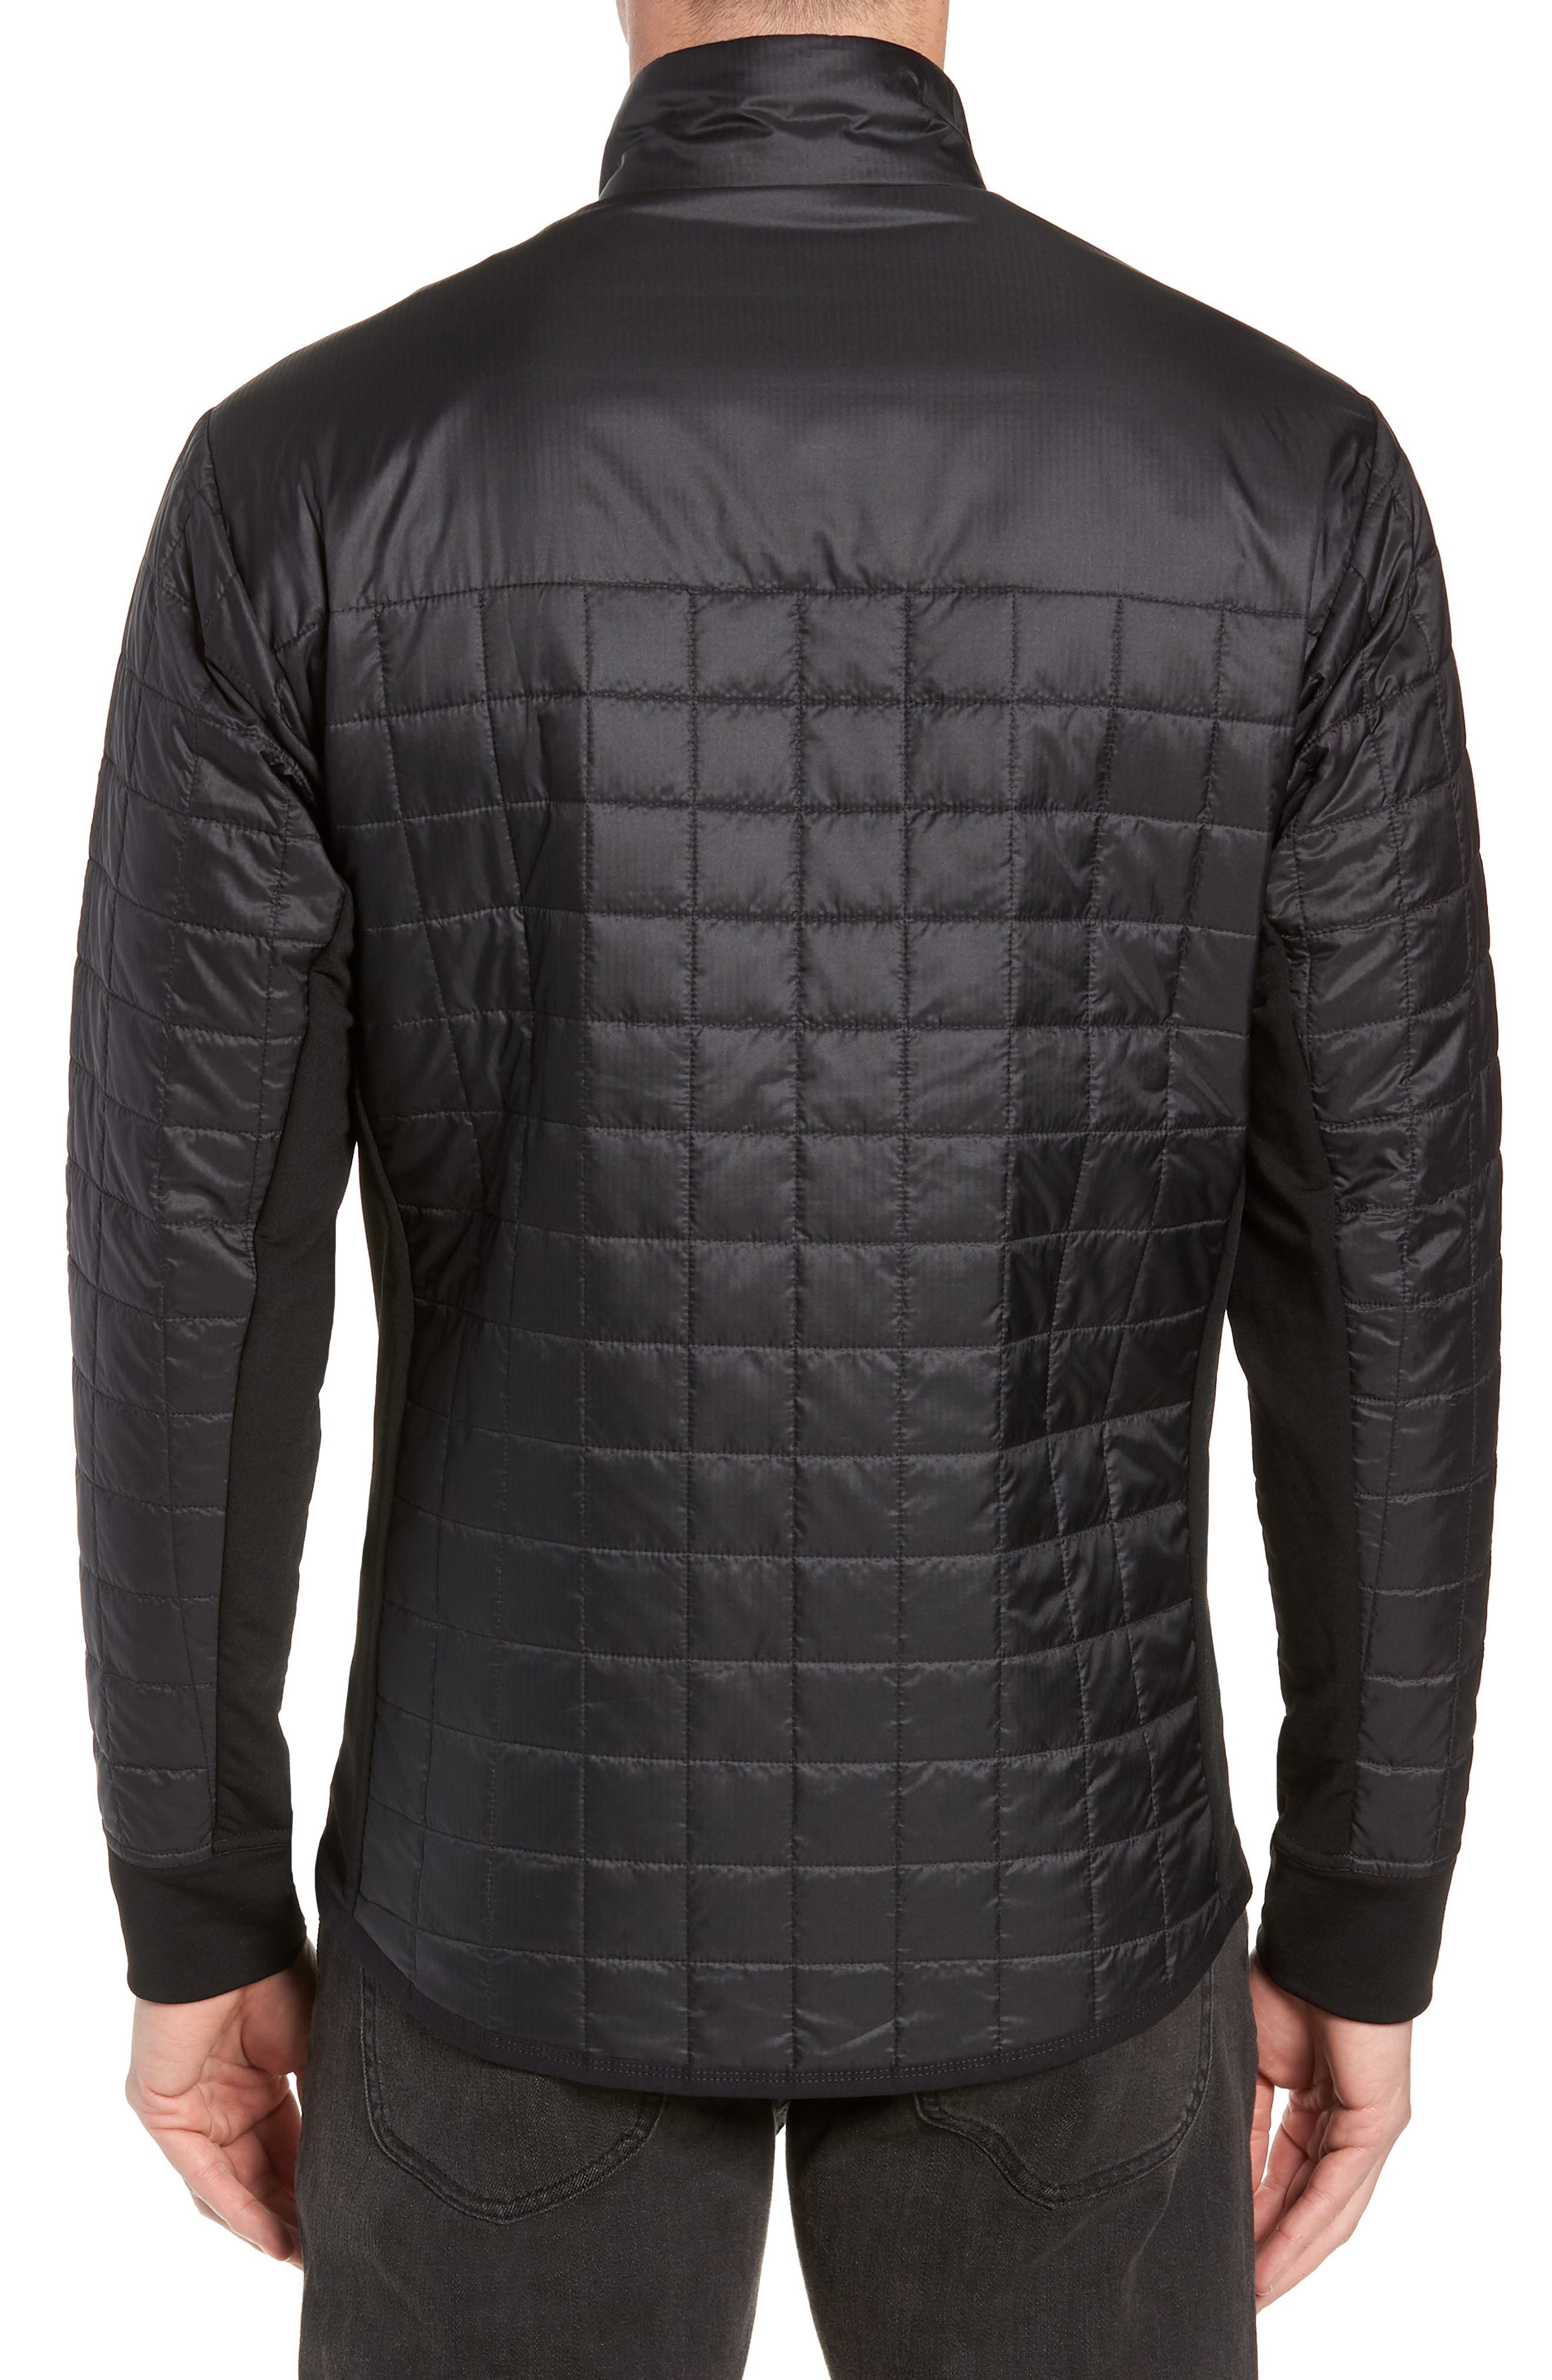 MerinoLOFT<sup>™</sup> Helix Midlayer Zip Jacket,                             Alternate thumbnail 2, color,                             BLACK/ JET HEATHER